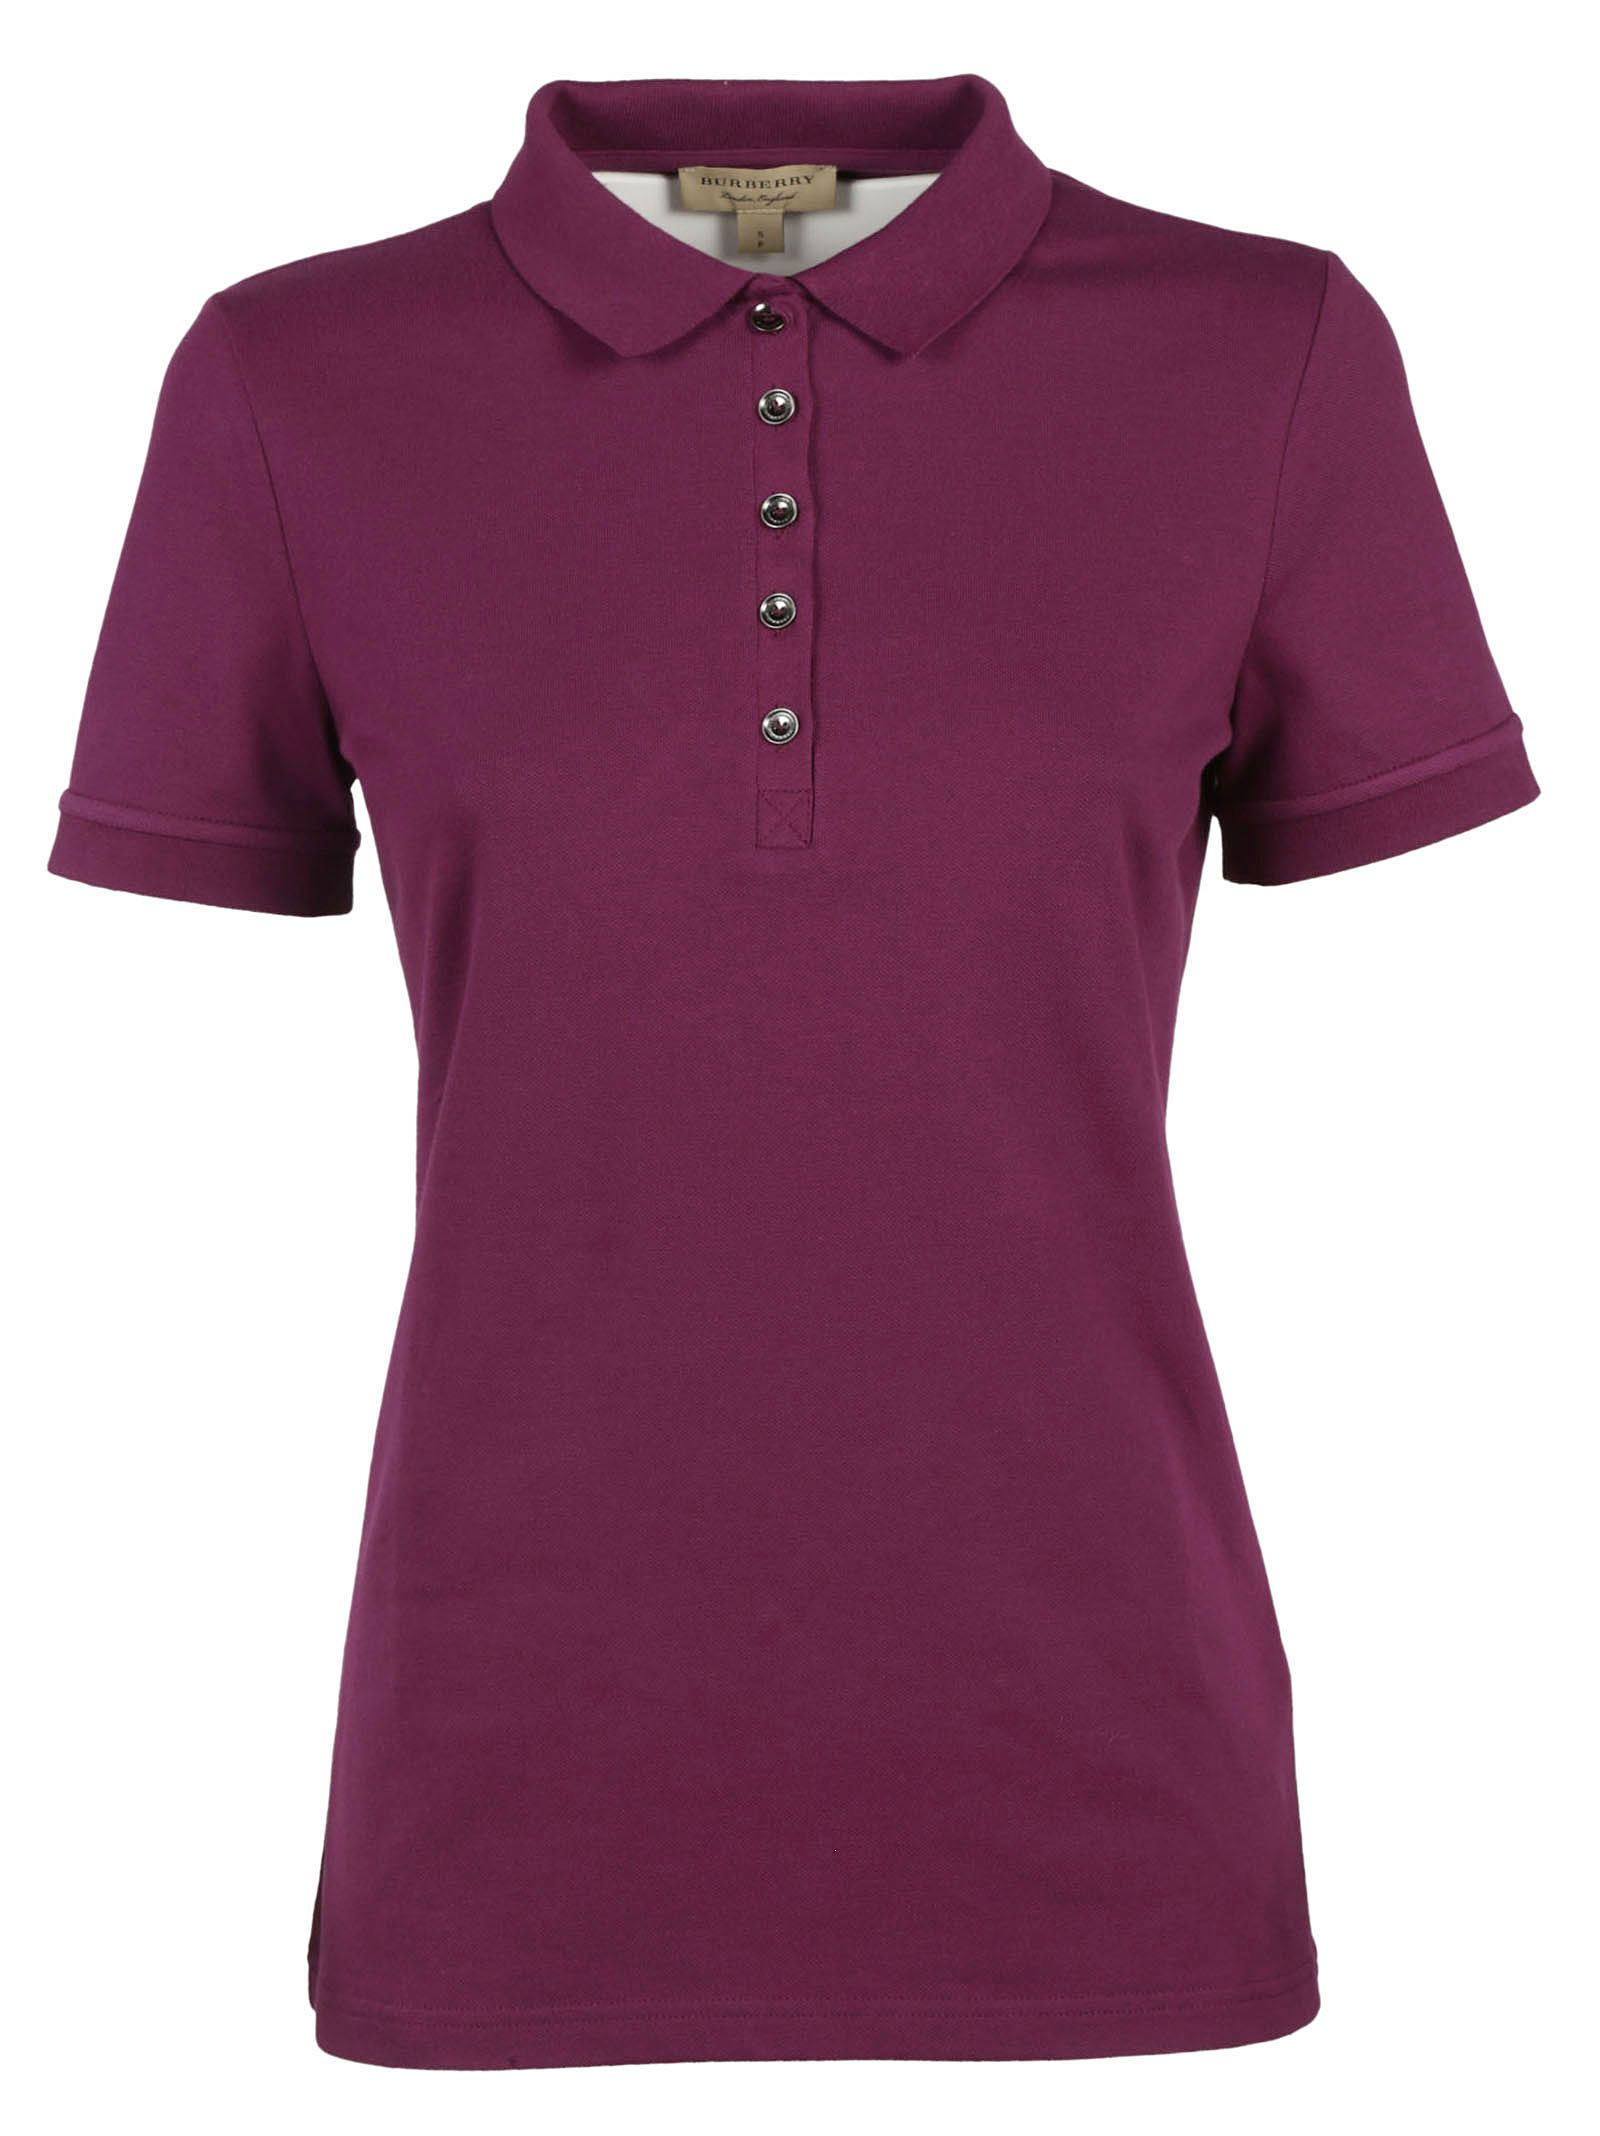 Burberry Burberry Brit Classic Polo Shirt - Magenta - 6069208   italist 064753dc6f5